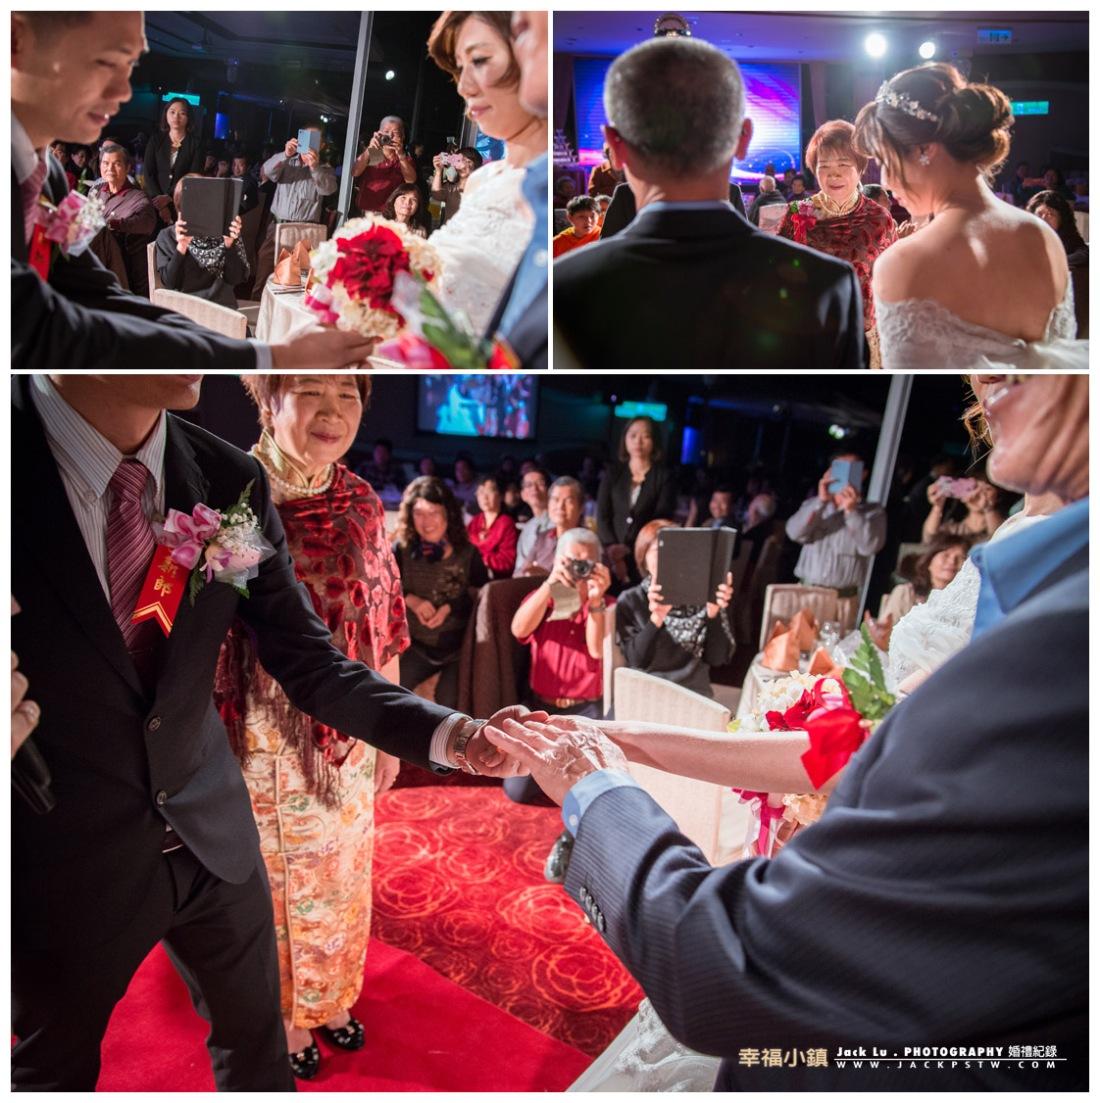 Taiwan-kaohsiung-wedding-ceremony-photography-jan14